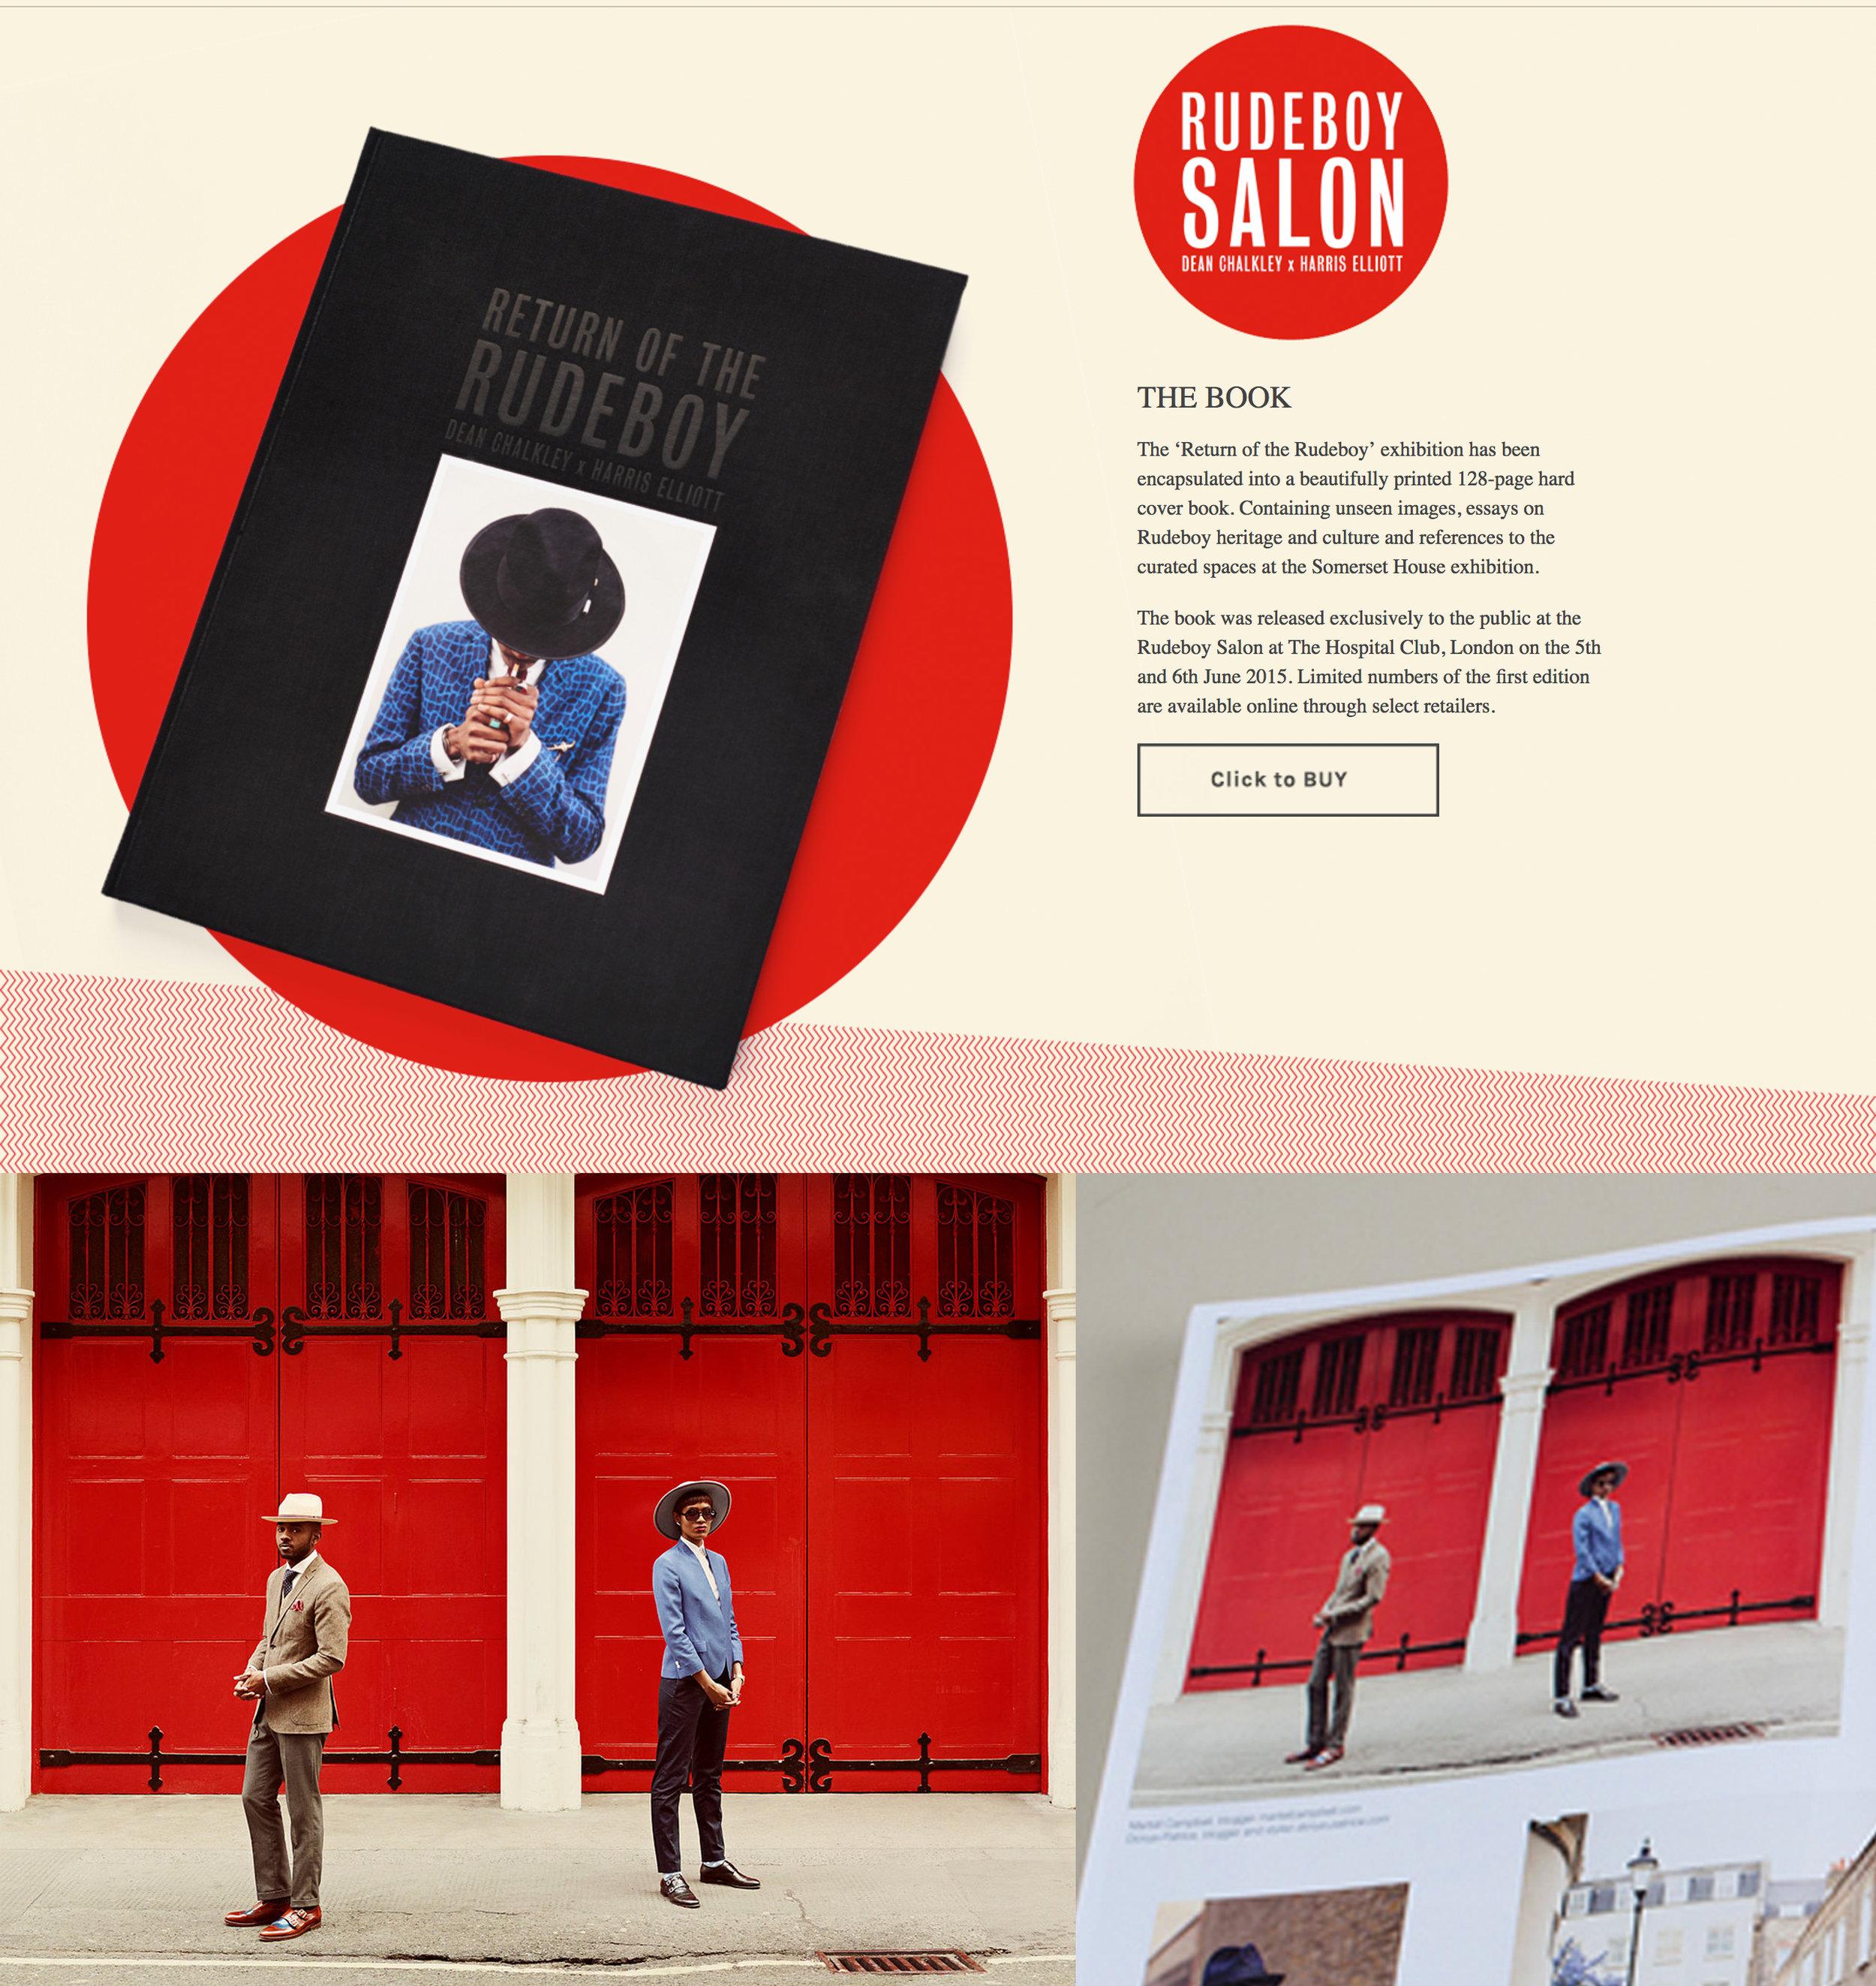 Return of The Rudeboy Exhibition/Book